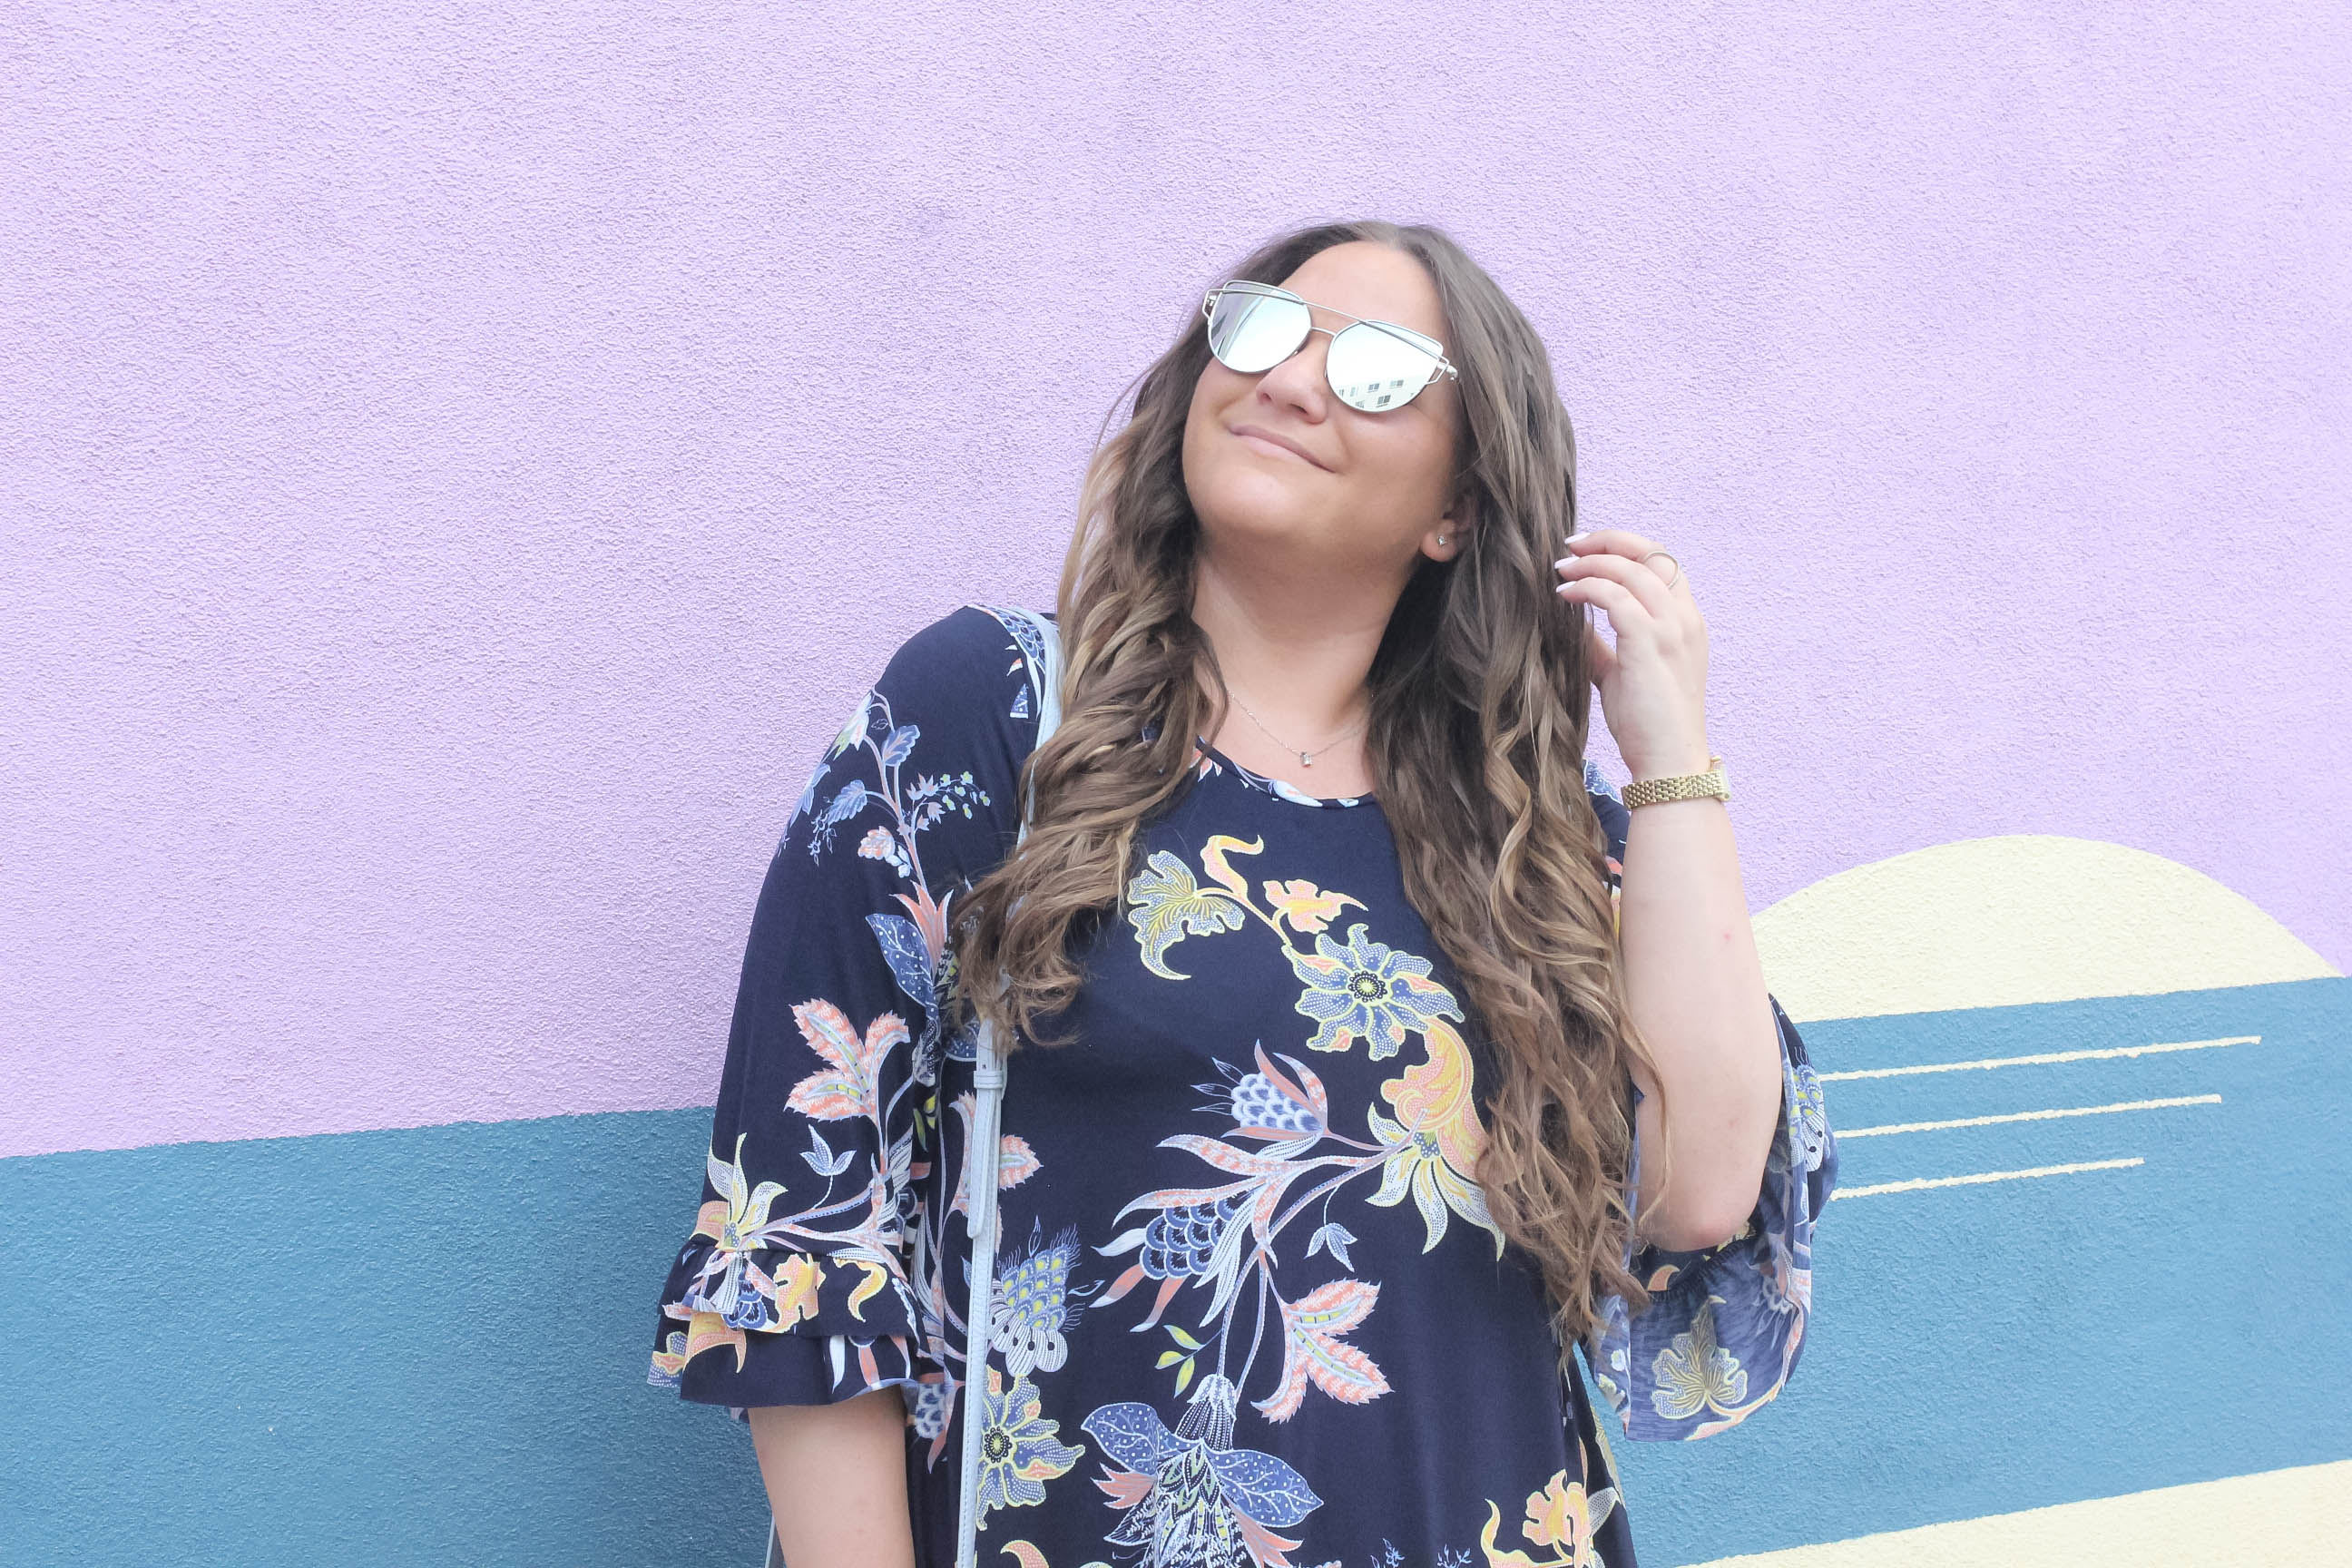 missyonmadison, missyonmadison instagram, missyonmadison blog, melissa tierney, fashion blog, fashion blogger, style blog, style blogger, floral dress, navy bell sleeve floral dress, bell sleeve dress, floral bell sleeve dress, bell sleeve navy dress, bell sleeve dress, white heels, white ankle strap heels, gigi new york bag, gigi new york crossbody bag, crossbody bag, raybans, la wall crawl, la wall art, palm tree wall, purple wall, bloglovin, la blogger,